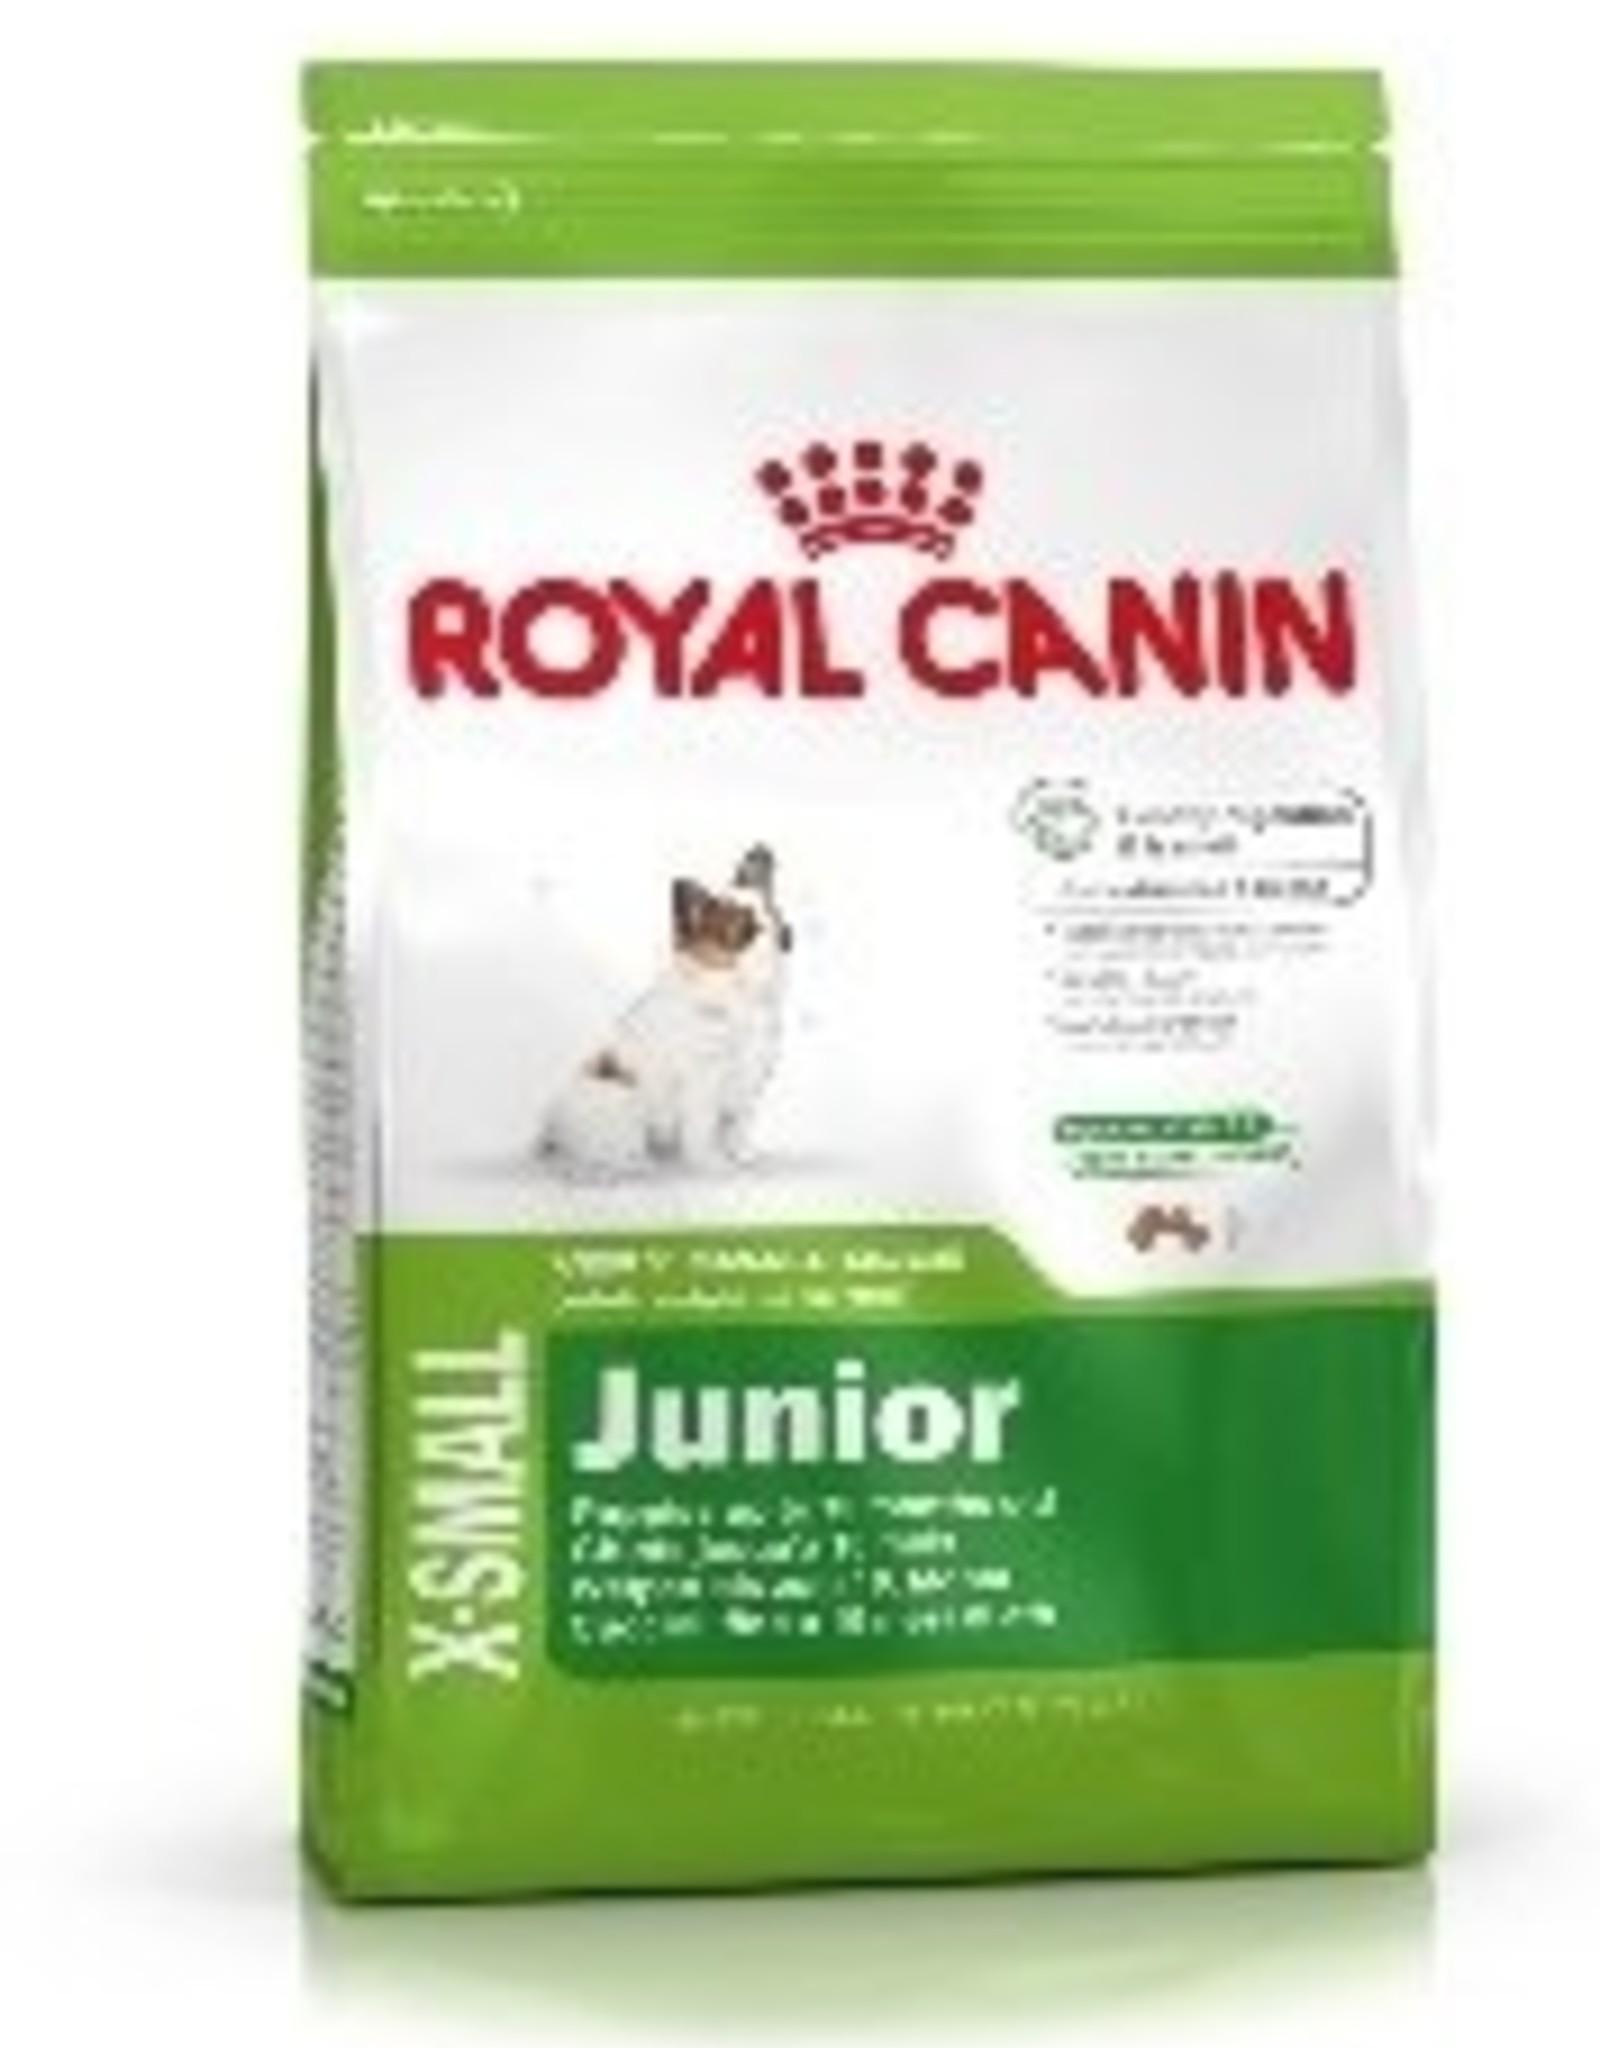 Royal Canin Royal Canin Shn X Small Junior Hund 3kg